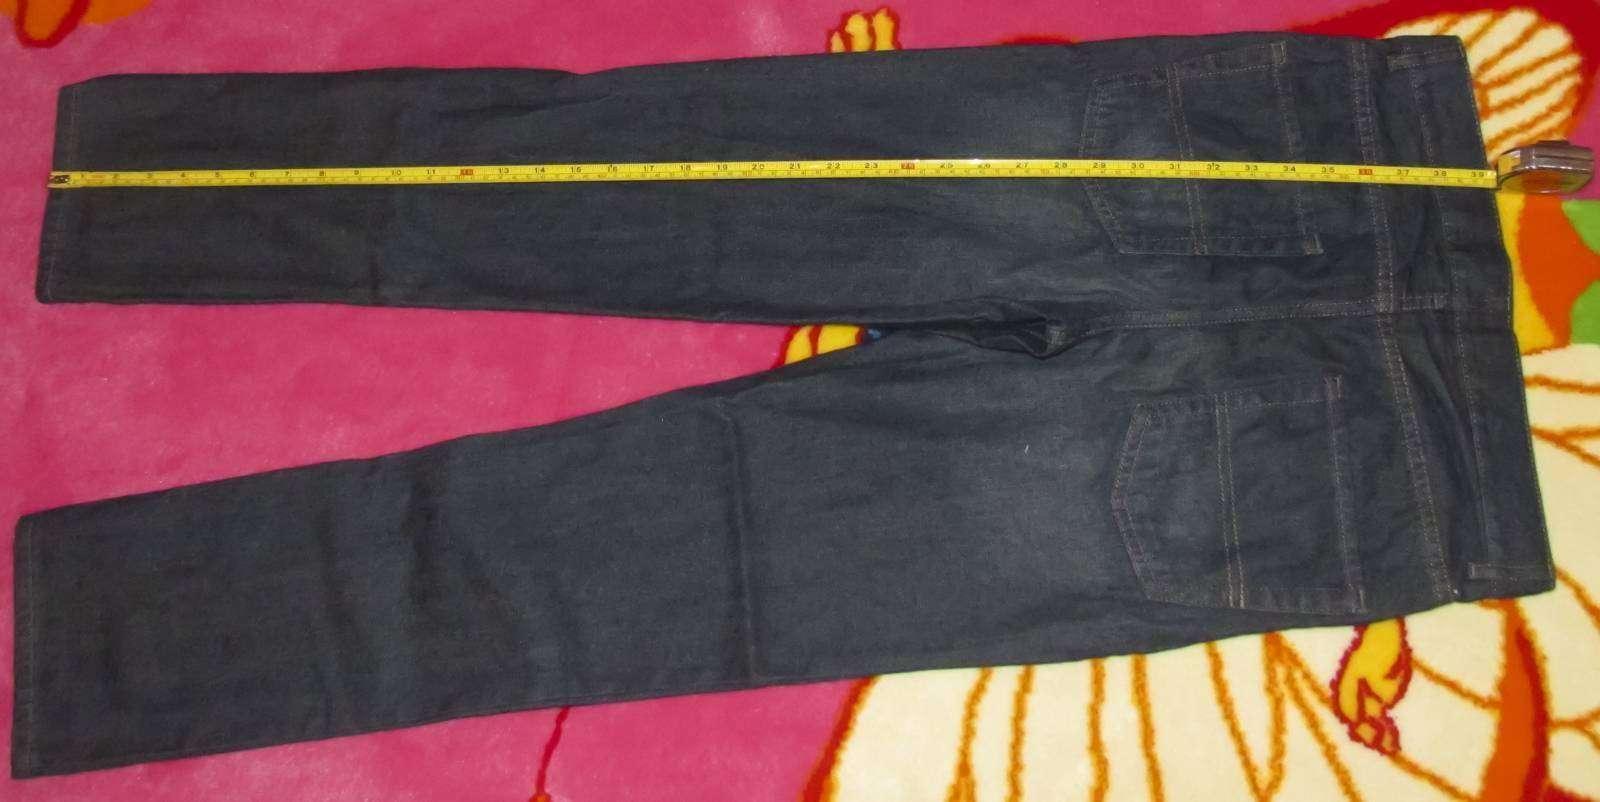 Childrens Place: Классические джинсы на мальчика, Boys Basic Straight Jeans - Dry Indigo Wash - размер 14